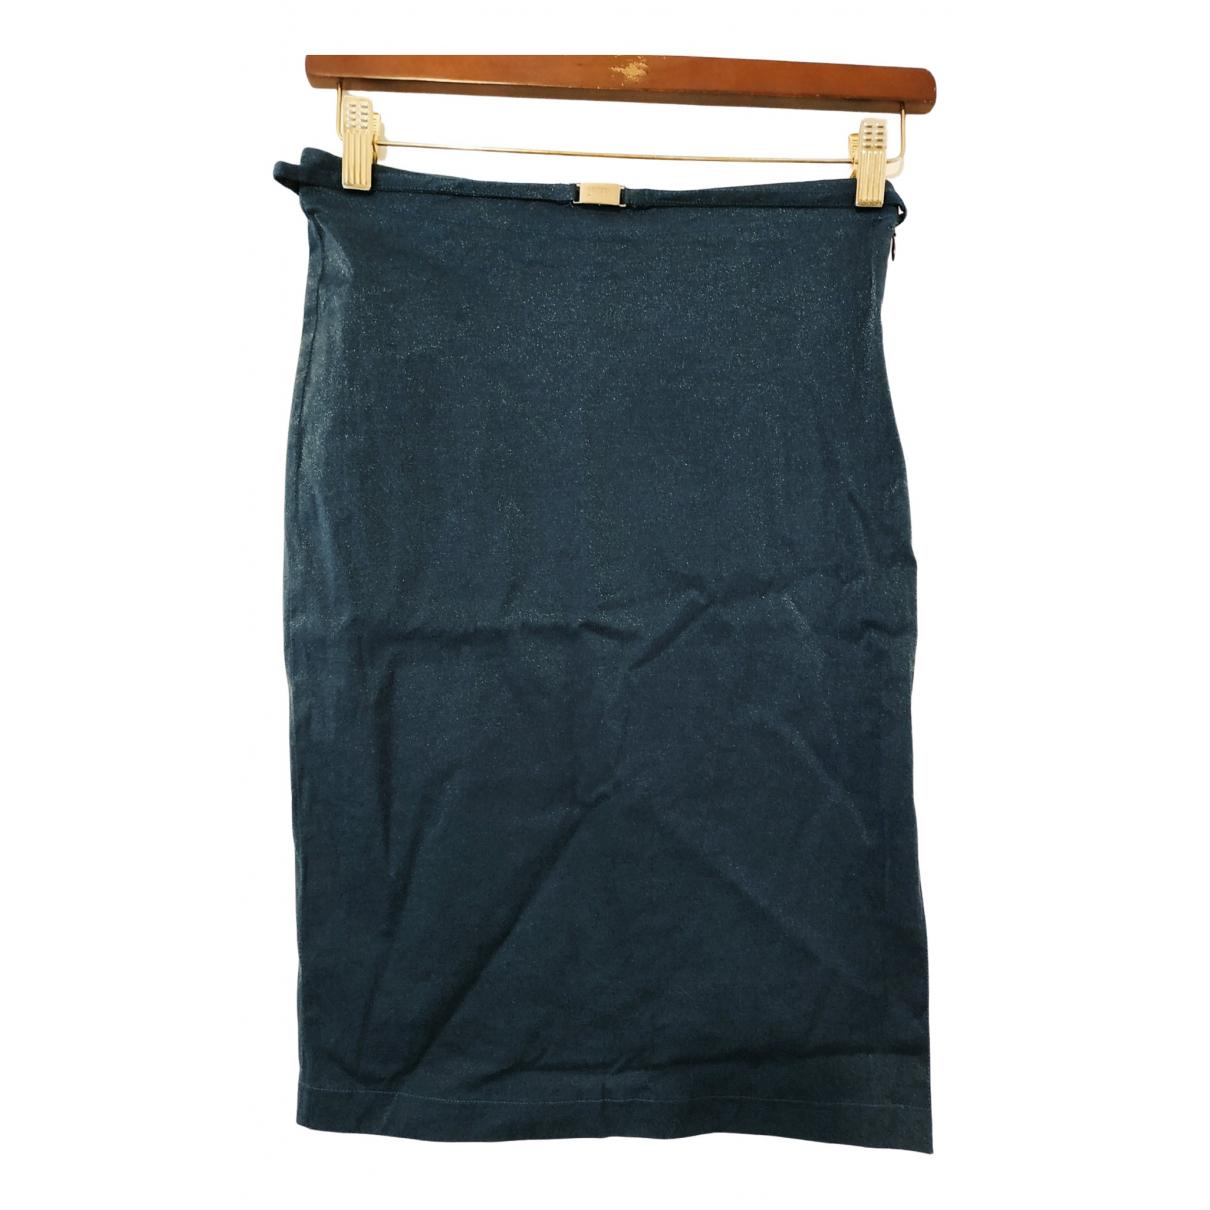 Gianfranco Ferré \N Blue Cotton skirt for Women M International